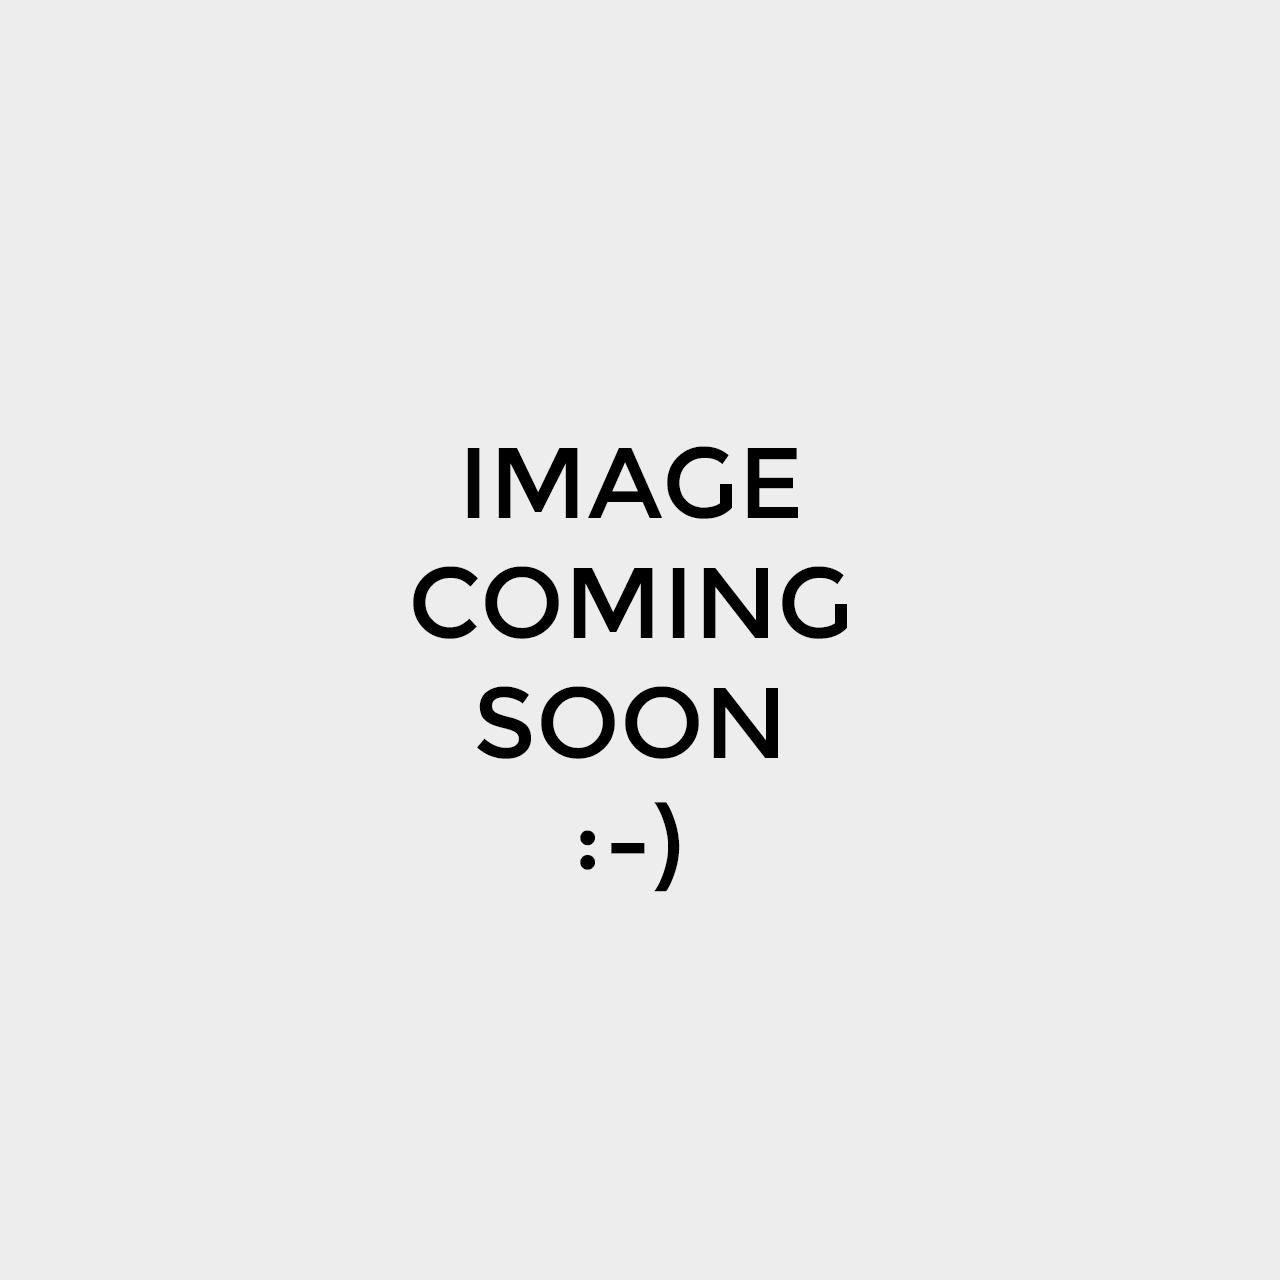 Nike Sportswear Womens Air Max BW (821956-001) ... 639f1c3d7